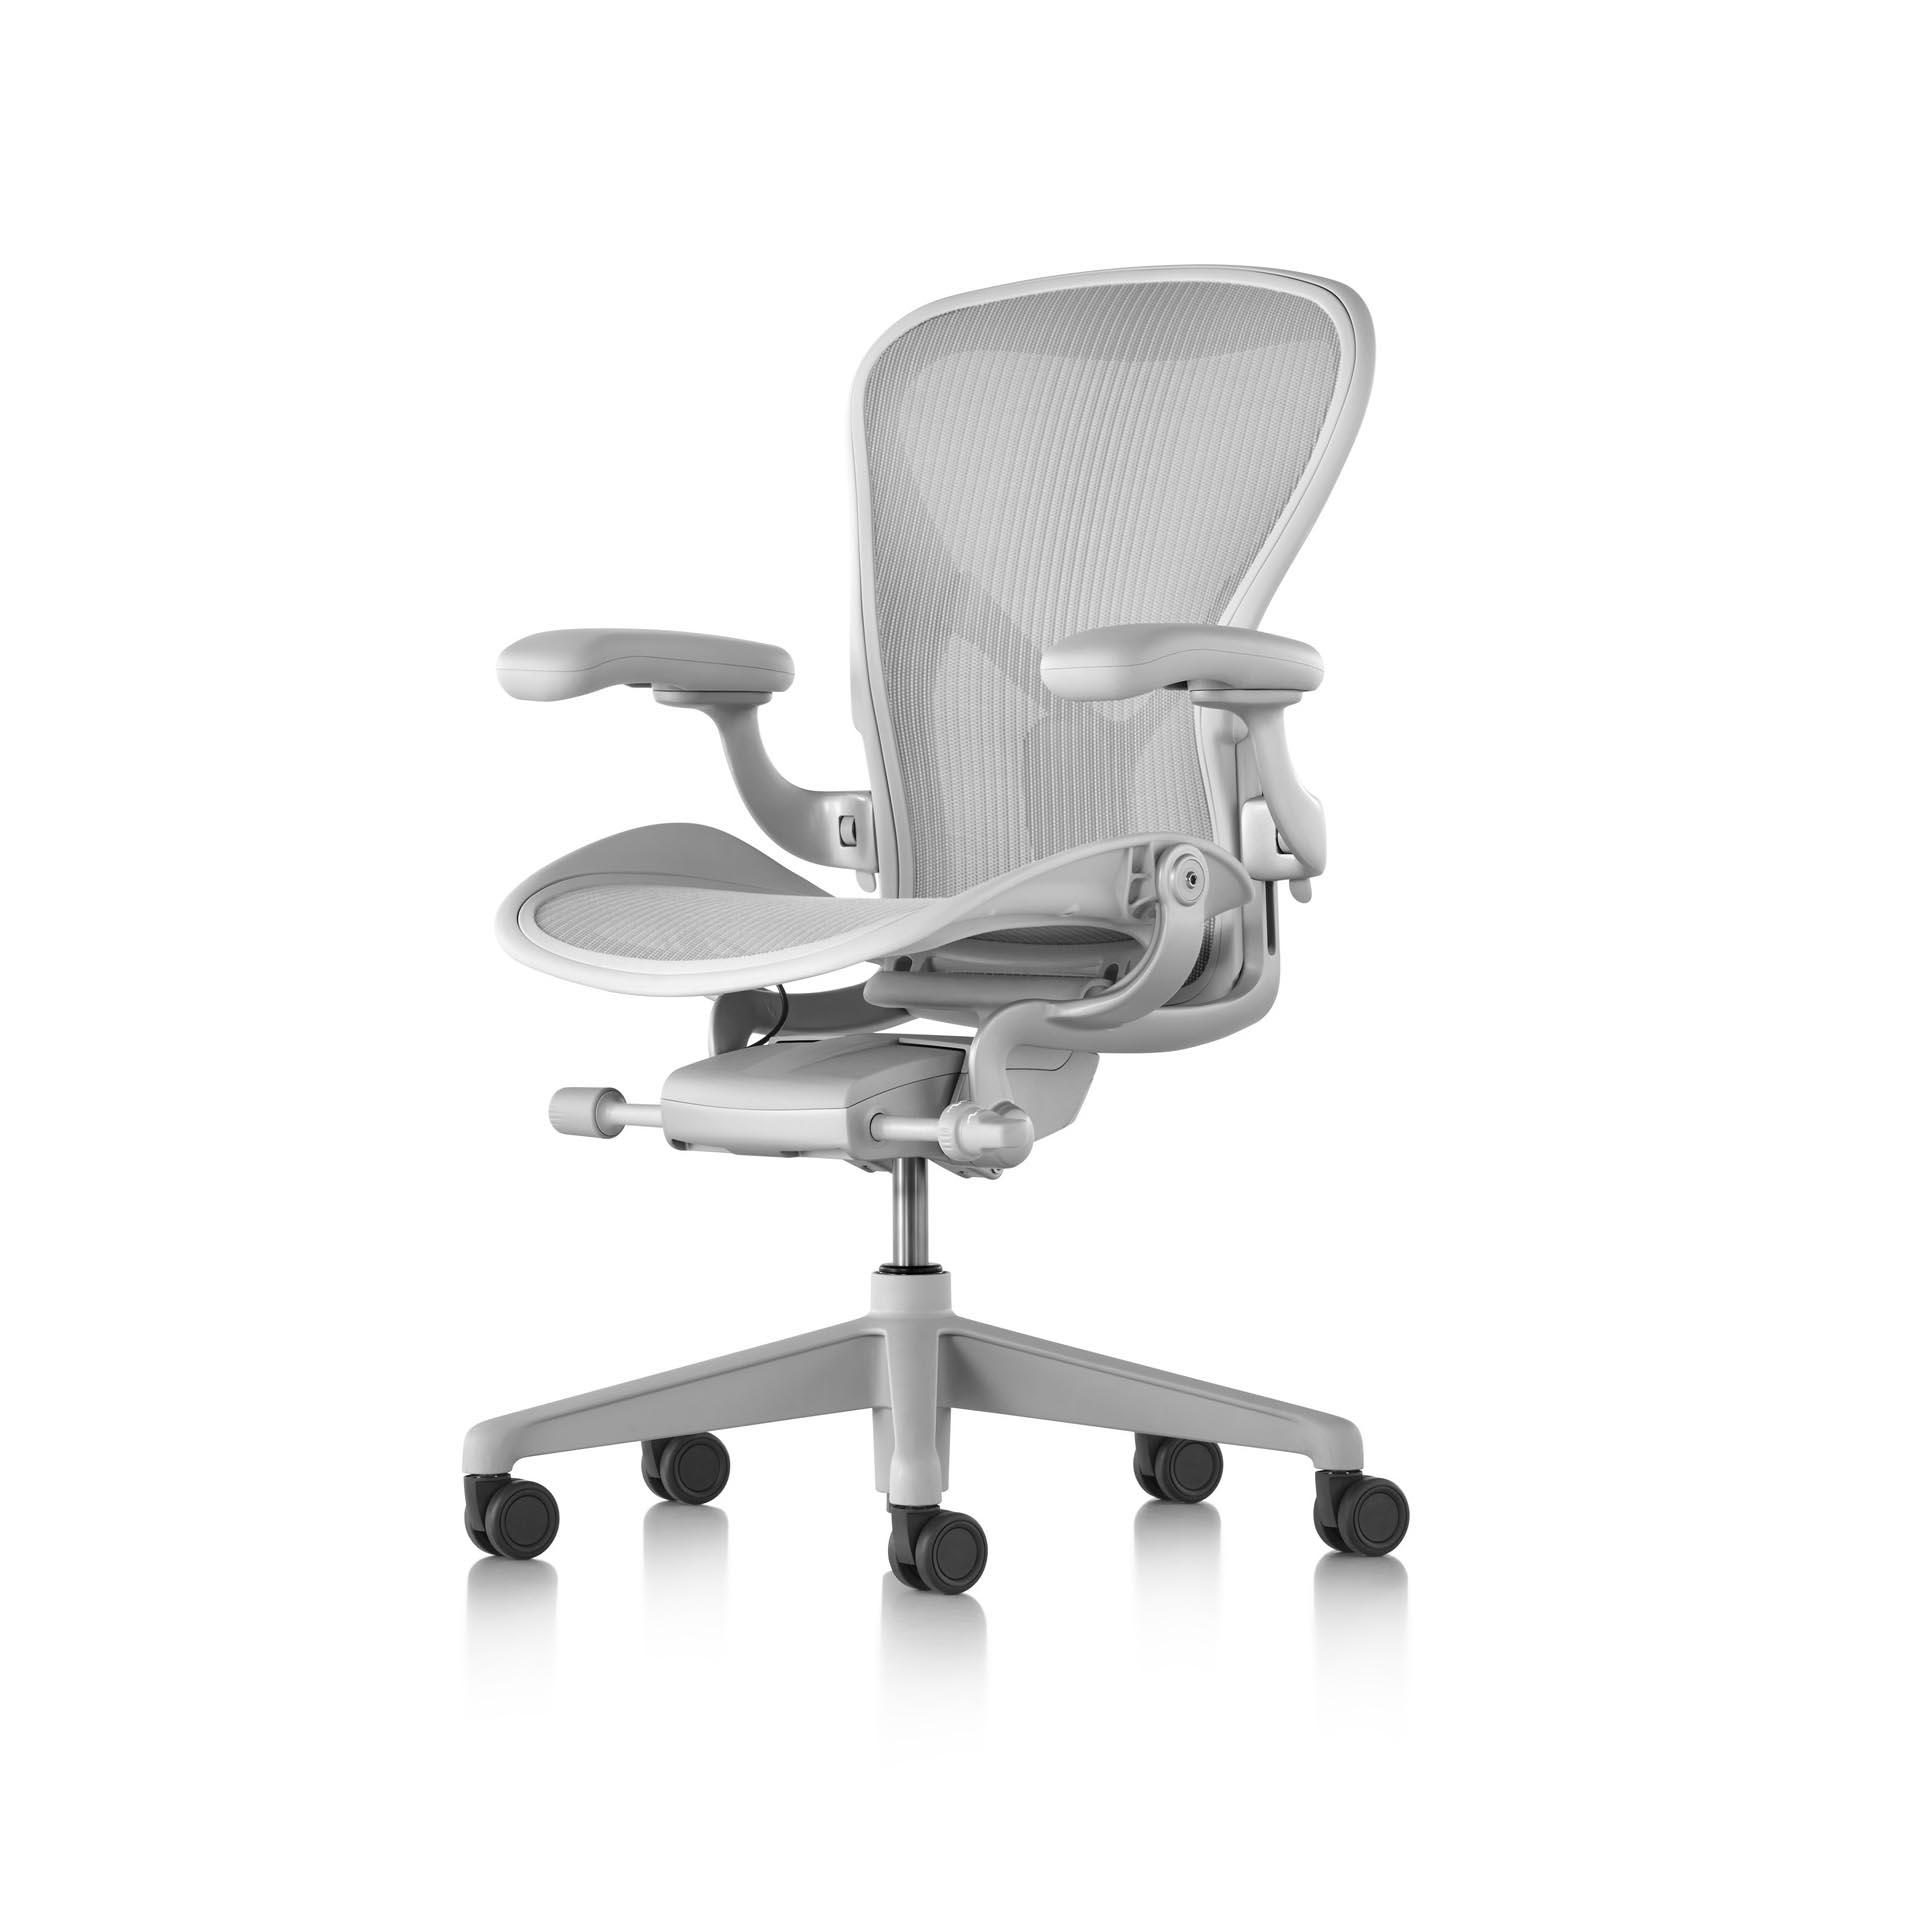 【Herman Miller正規販売店】アーロンチェア リマスタード Aeron Chair Remastered  ポスチャーフィットSL フル装備 ミネラル ビニールアーム